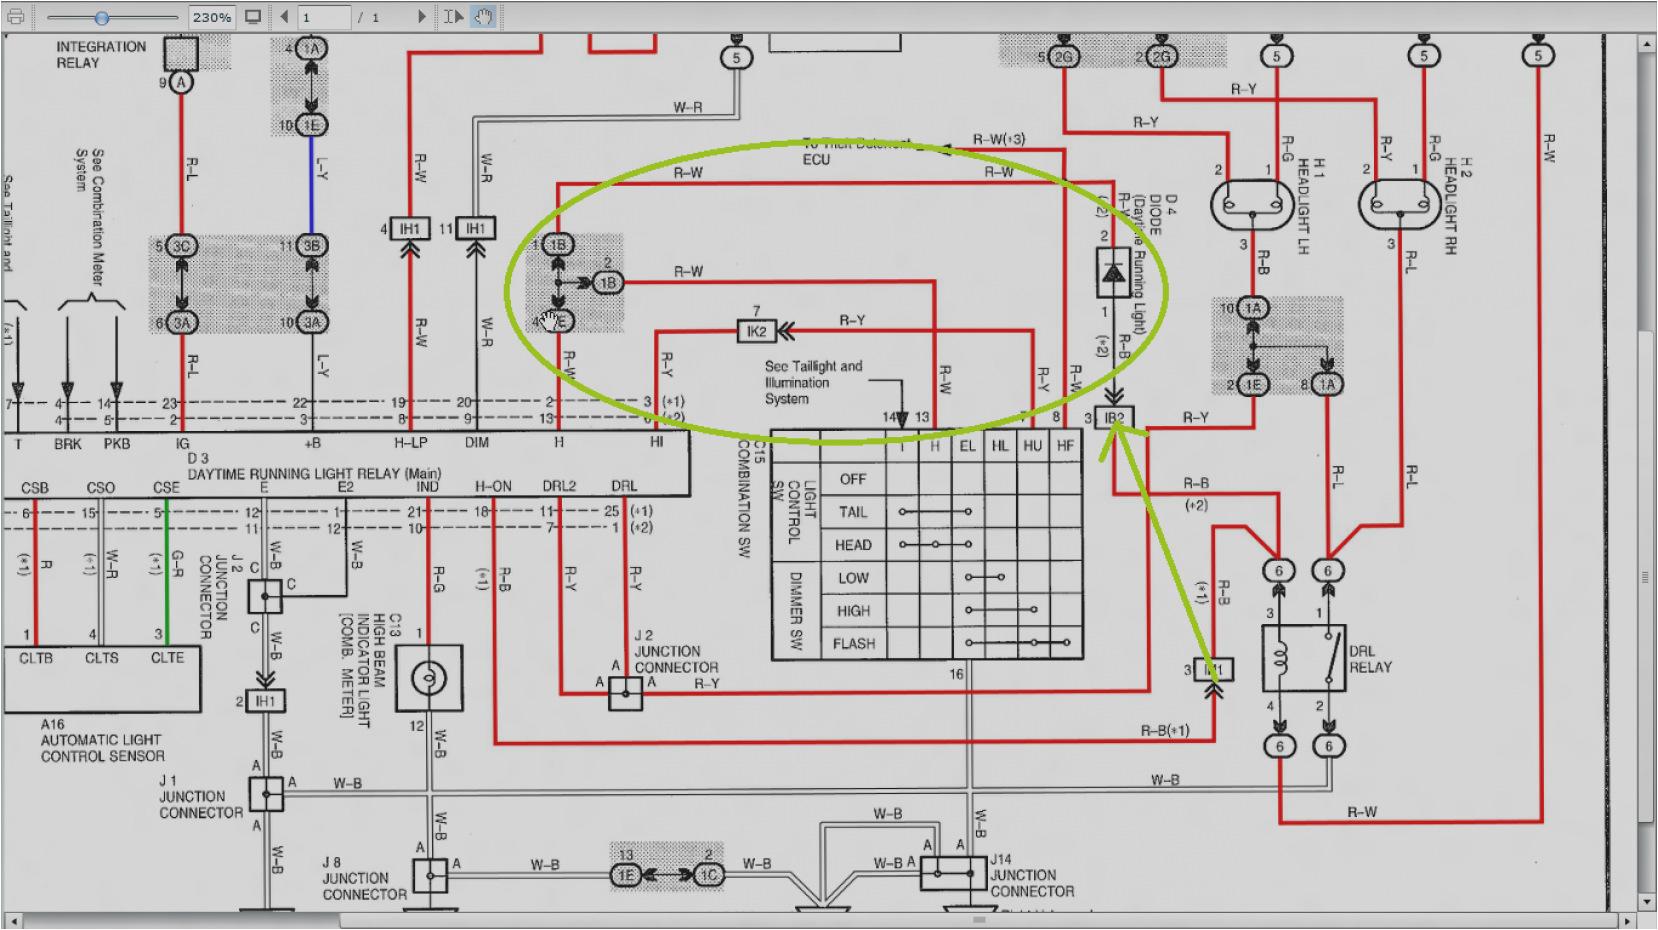 72 toyota corolla wiring diagram wiring diagram autovehicle 72 e100 wiring diagram electrical wiring diagram72 toyota